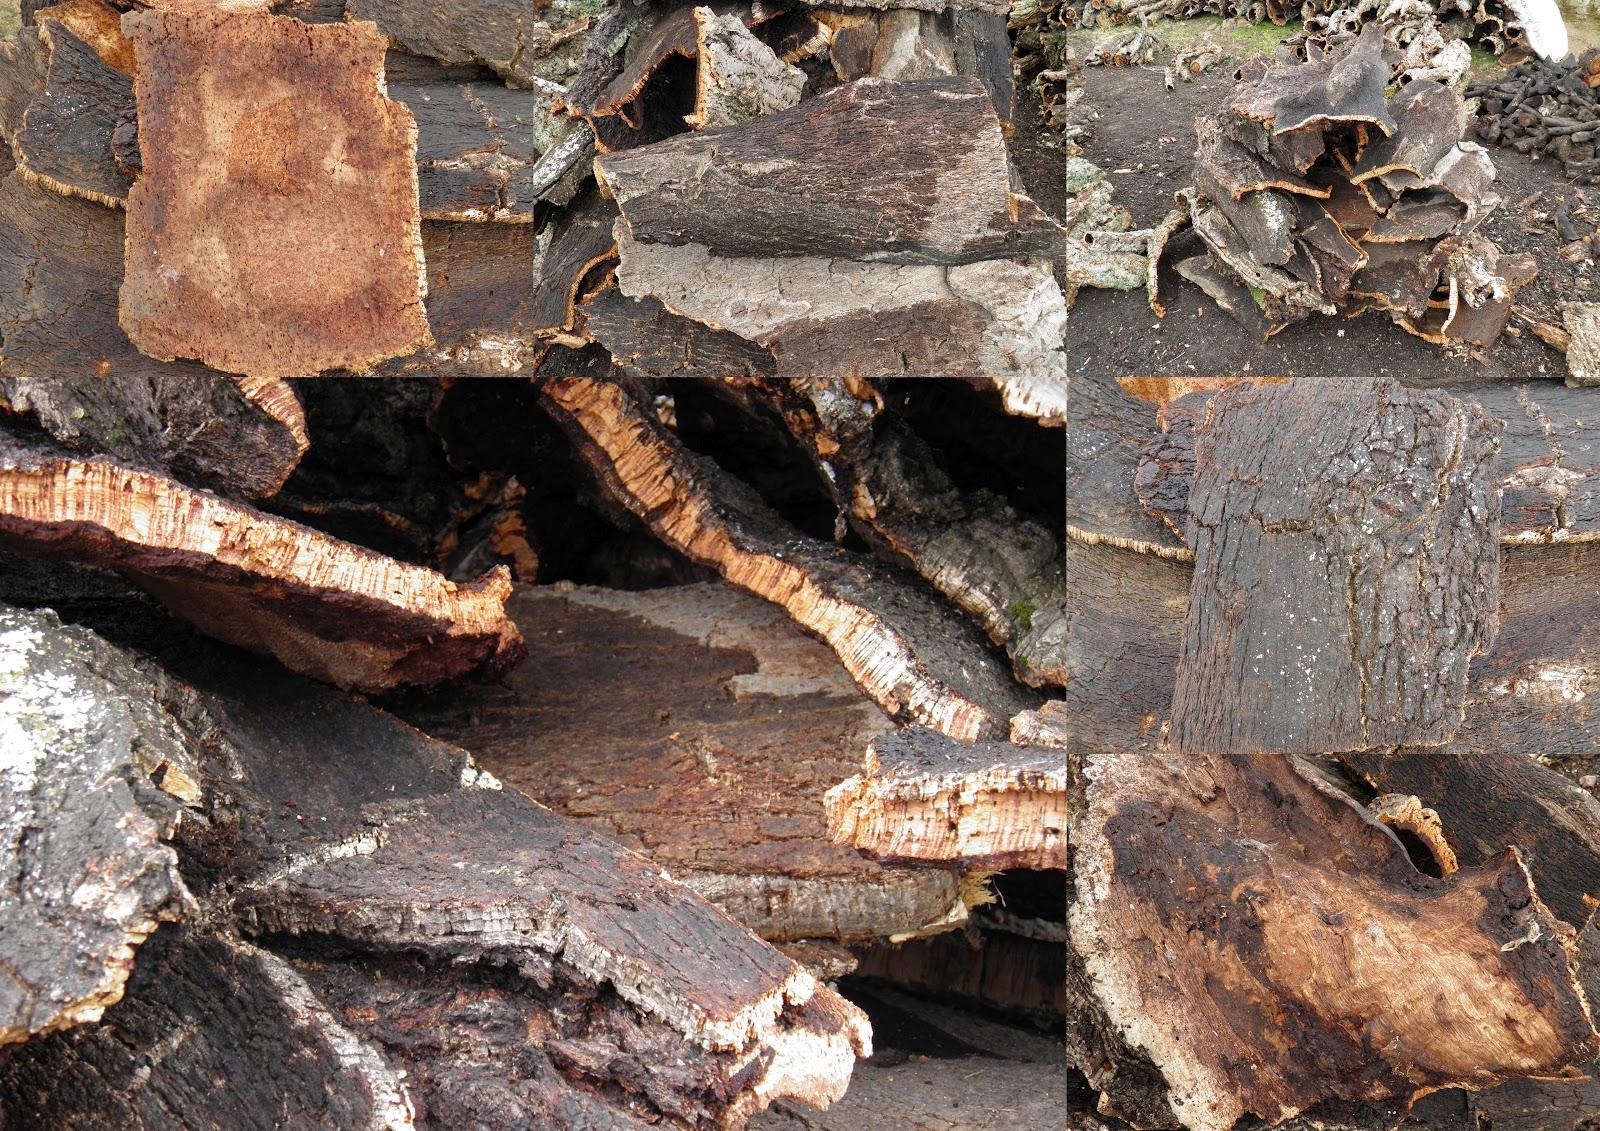 Terrario natural planchas de corcho - Planchas de corcho ...